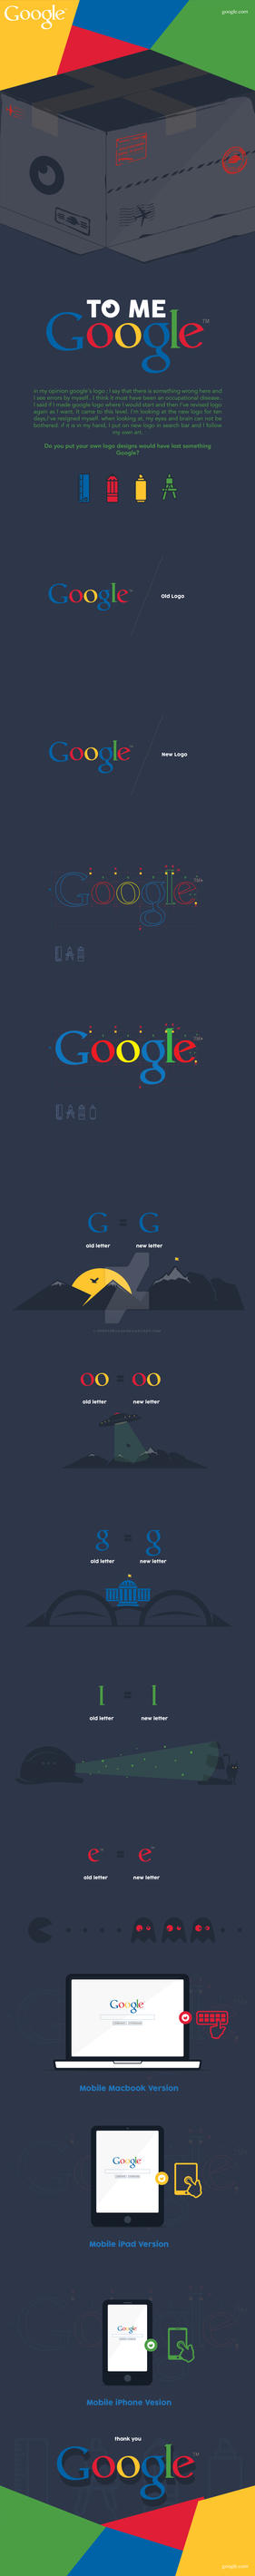 Google in my opinion! by operadevil69